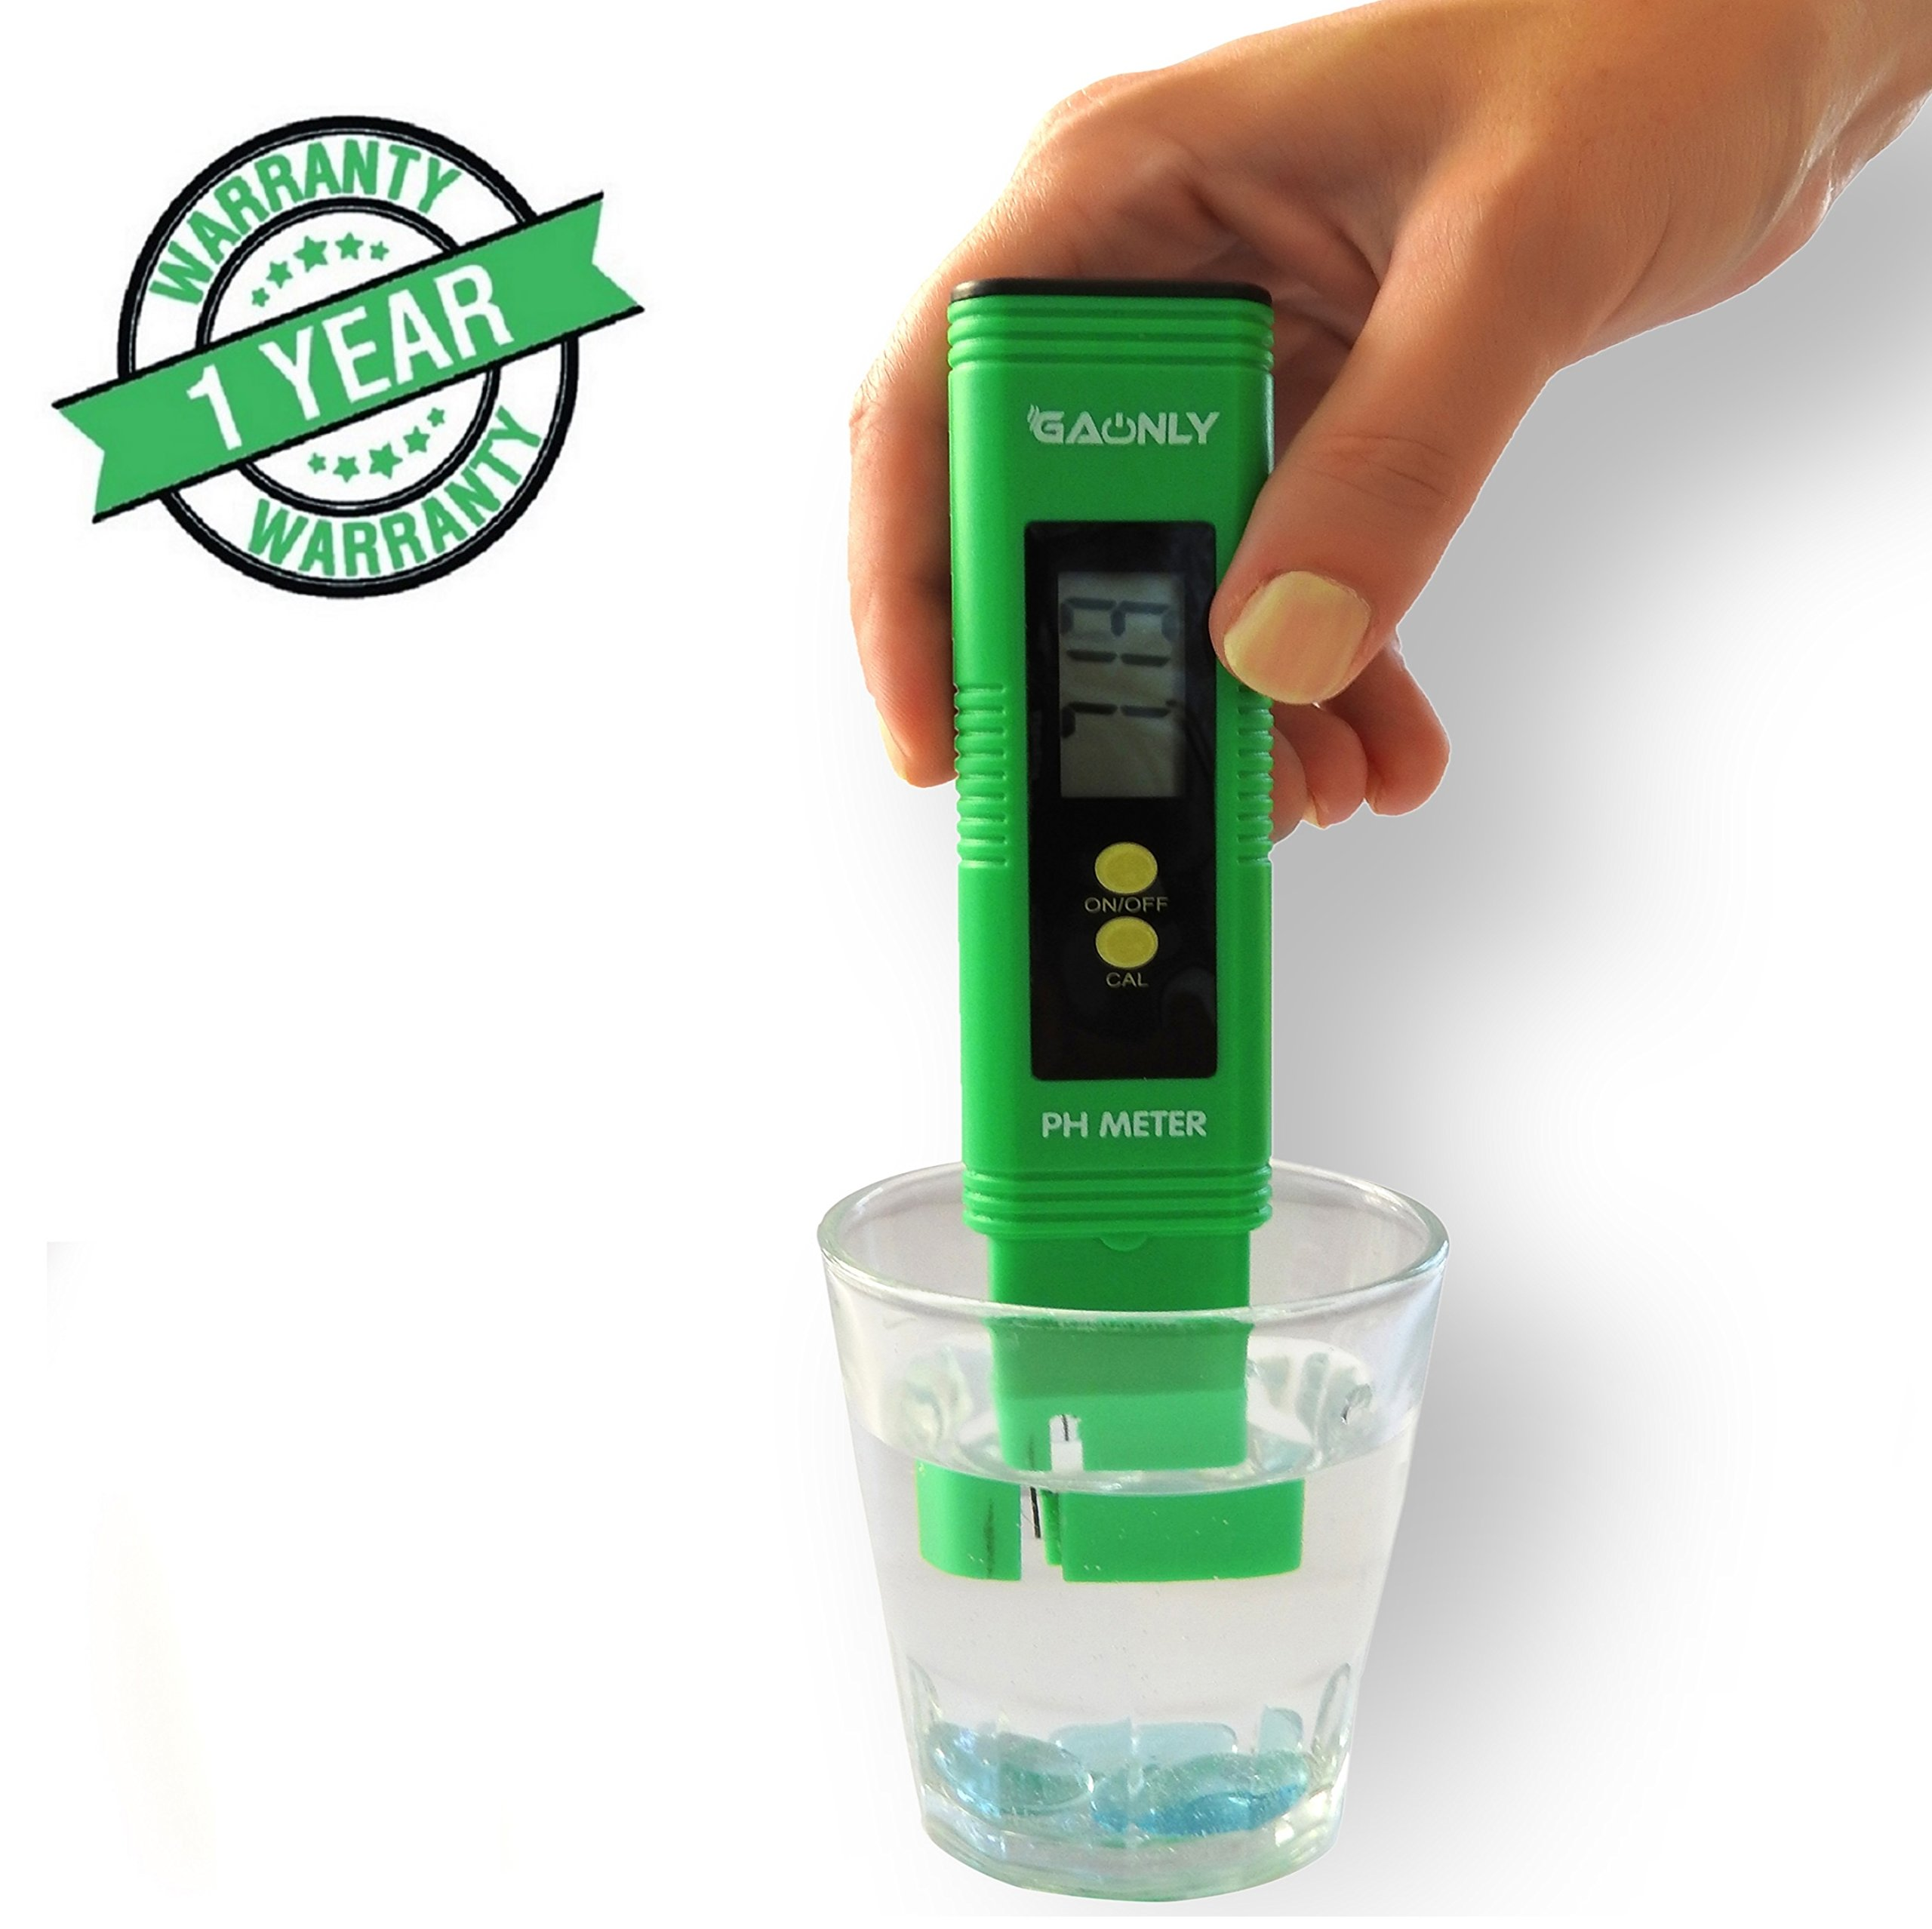 Digital PH Meter,PH Tester -Water, Pool,Fish Tank, Hydroponics, Education.3 x pH Buffer Powders, Automatic Calibration,Range 0.00-14.00 pH,ATC,Auto-shut off.Greeting card .Green.